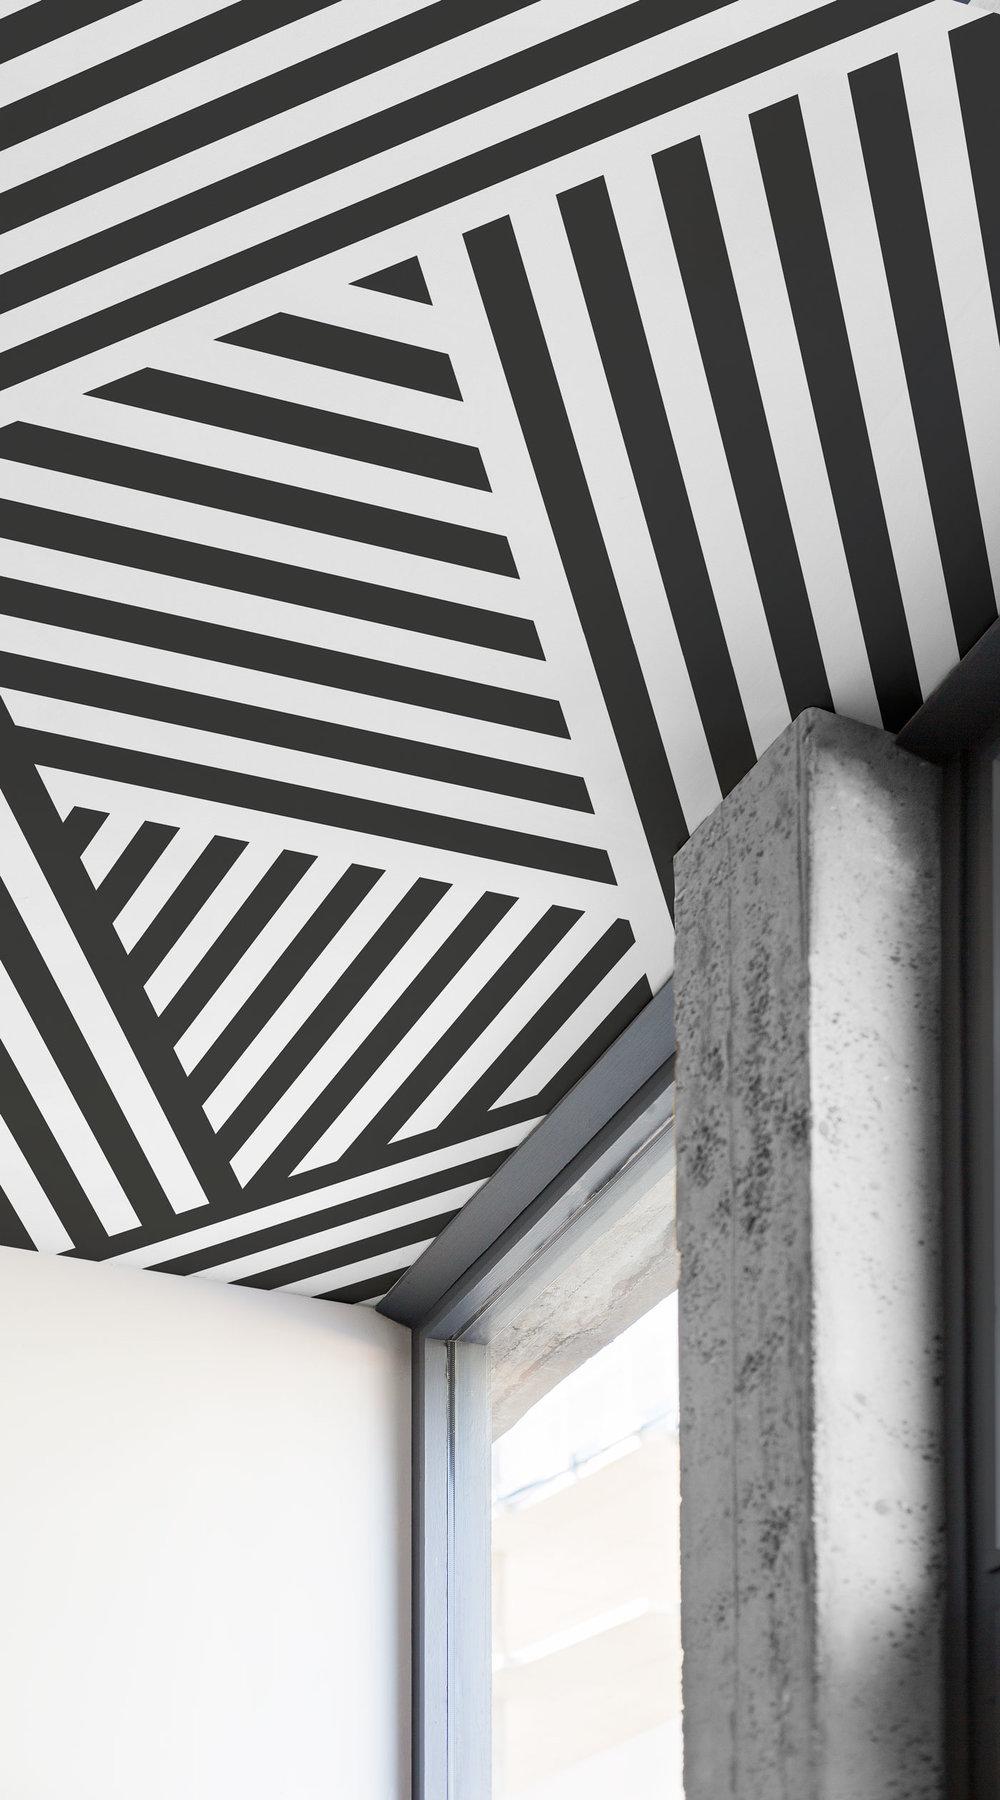 Divert-Stripes-GeometricCeiling-Lifestyle-WEBBLOG copy 2.jpg